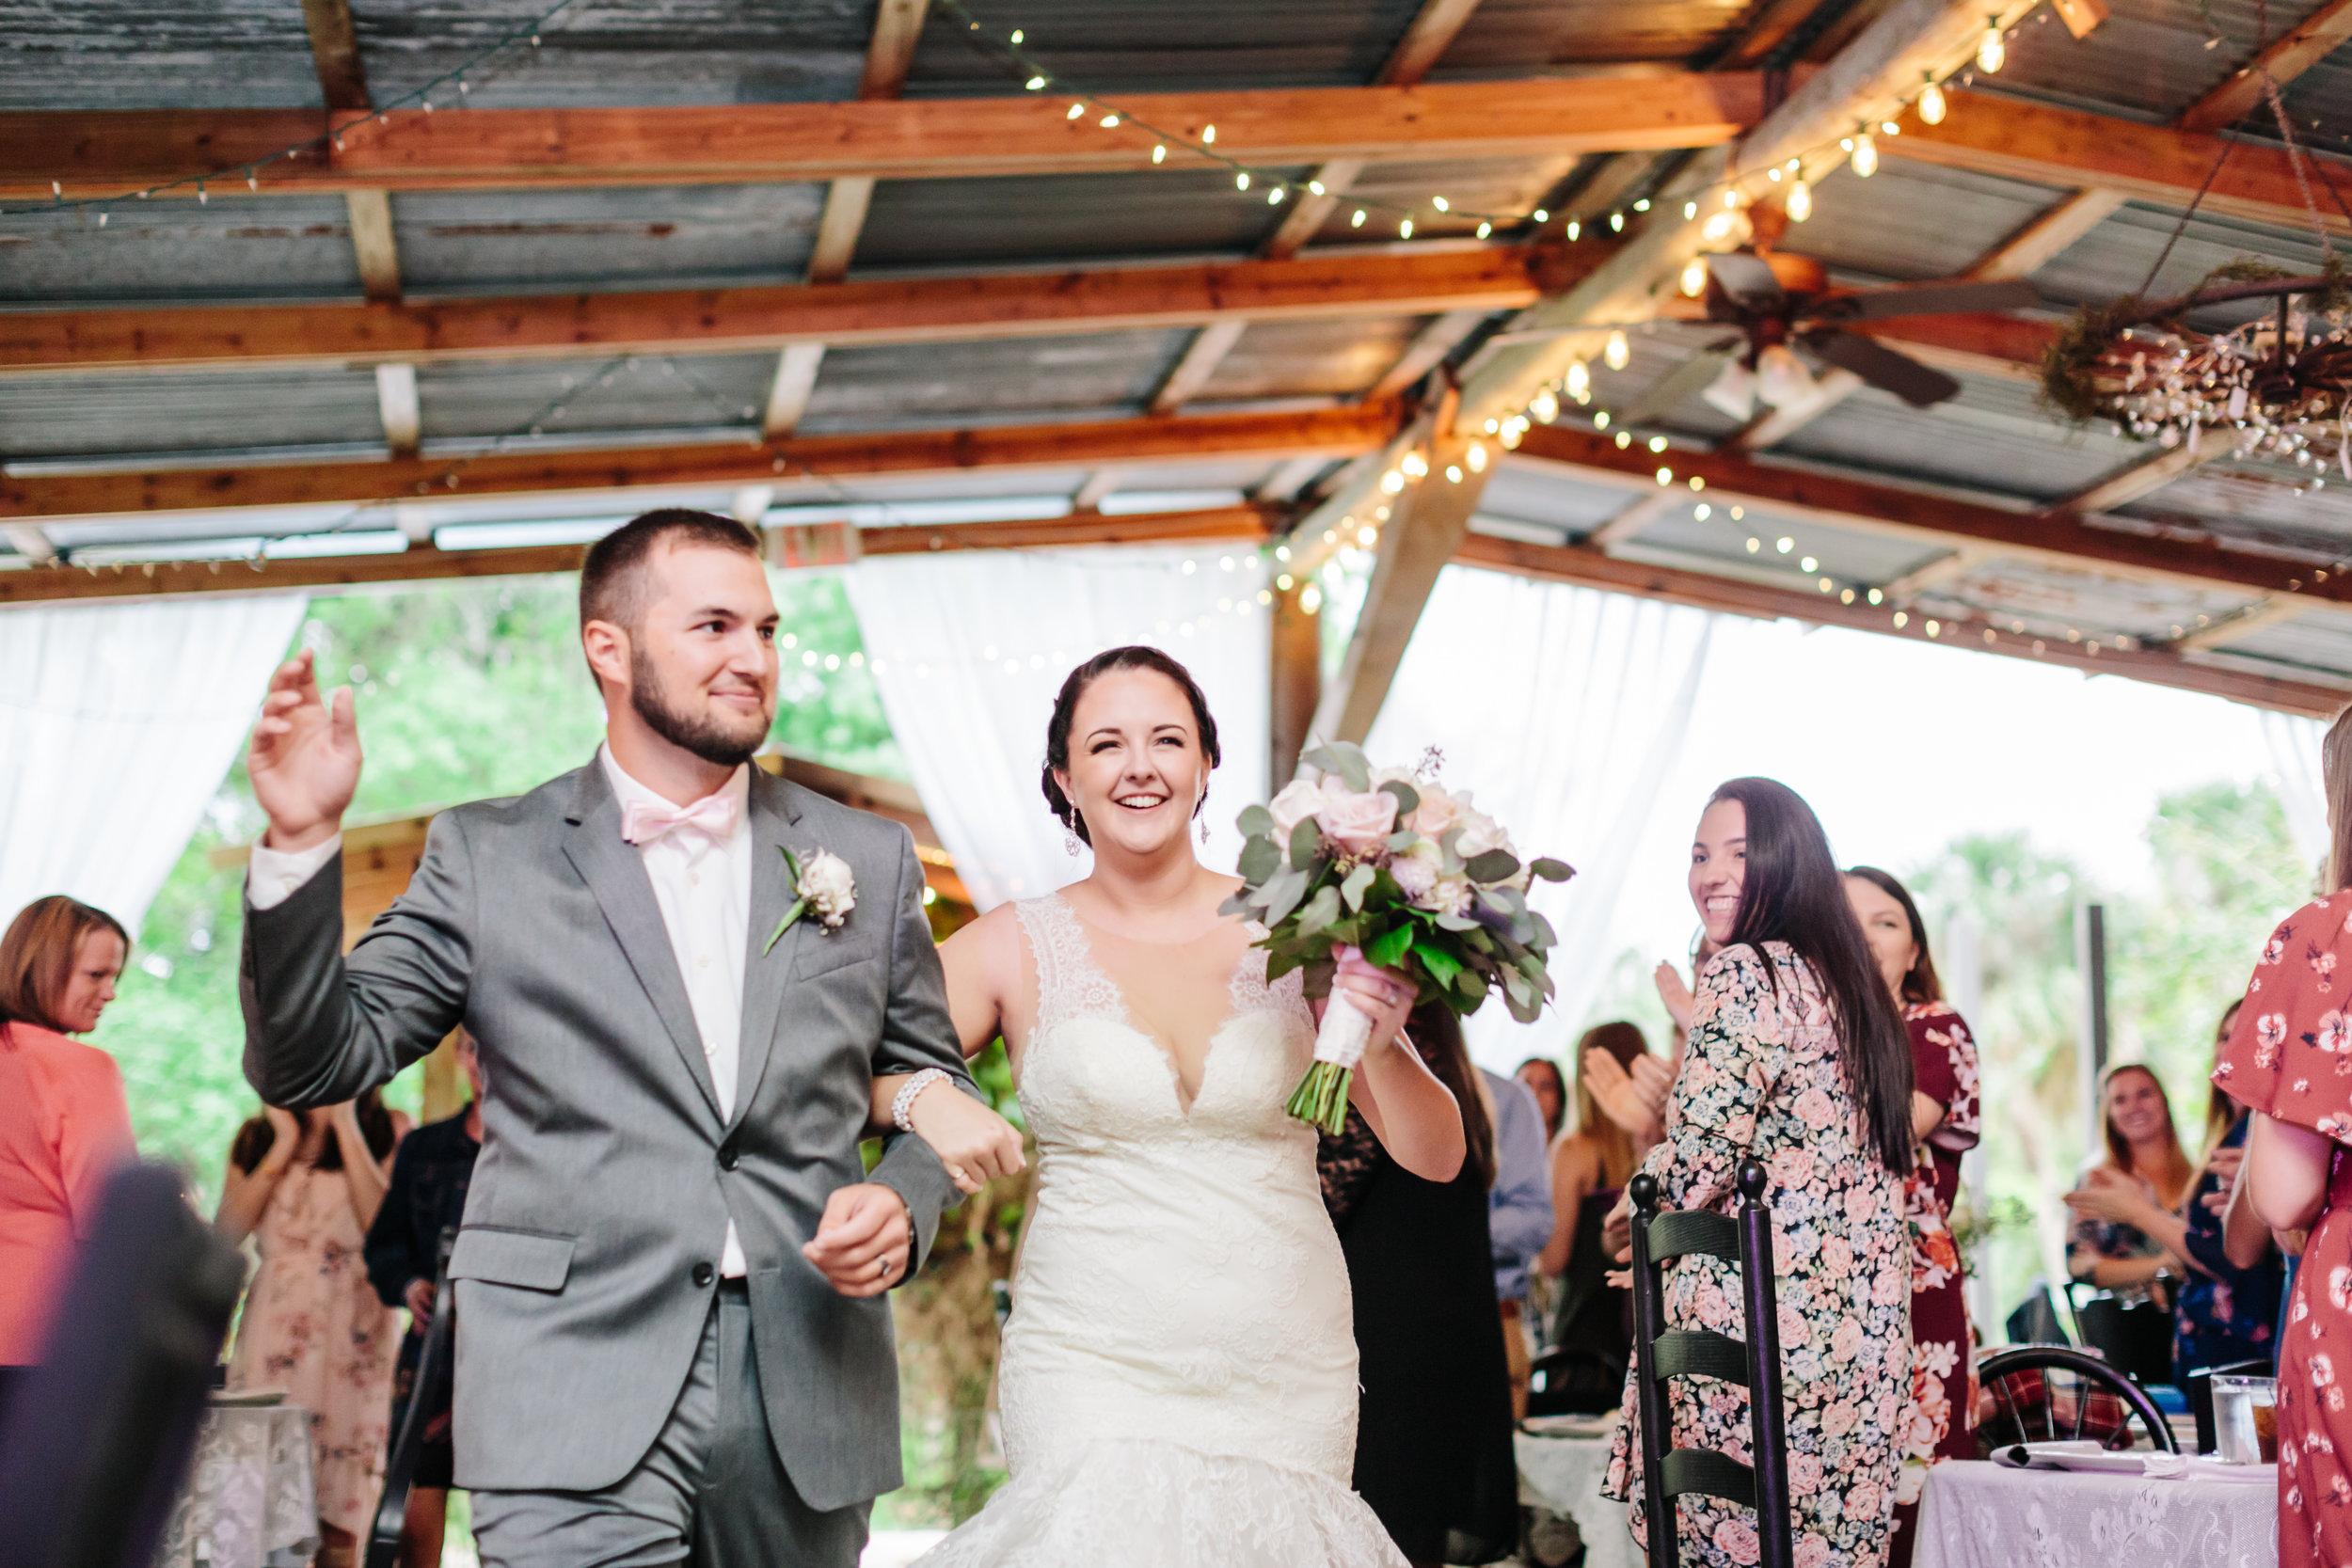 Kaleb and Cole Swancott Birdsong Barn Wedding (472 of 545).jpg